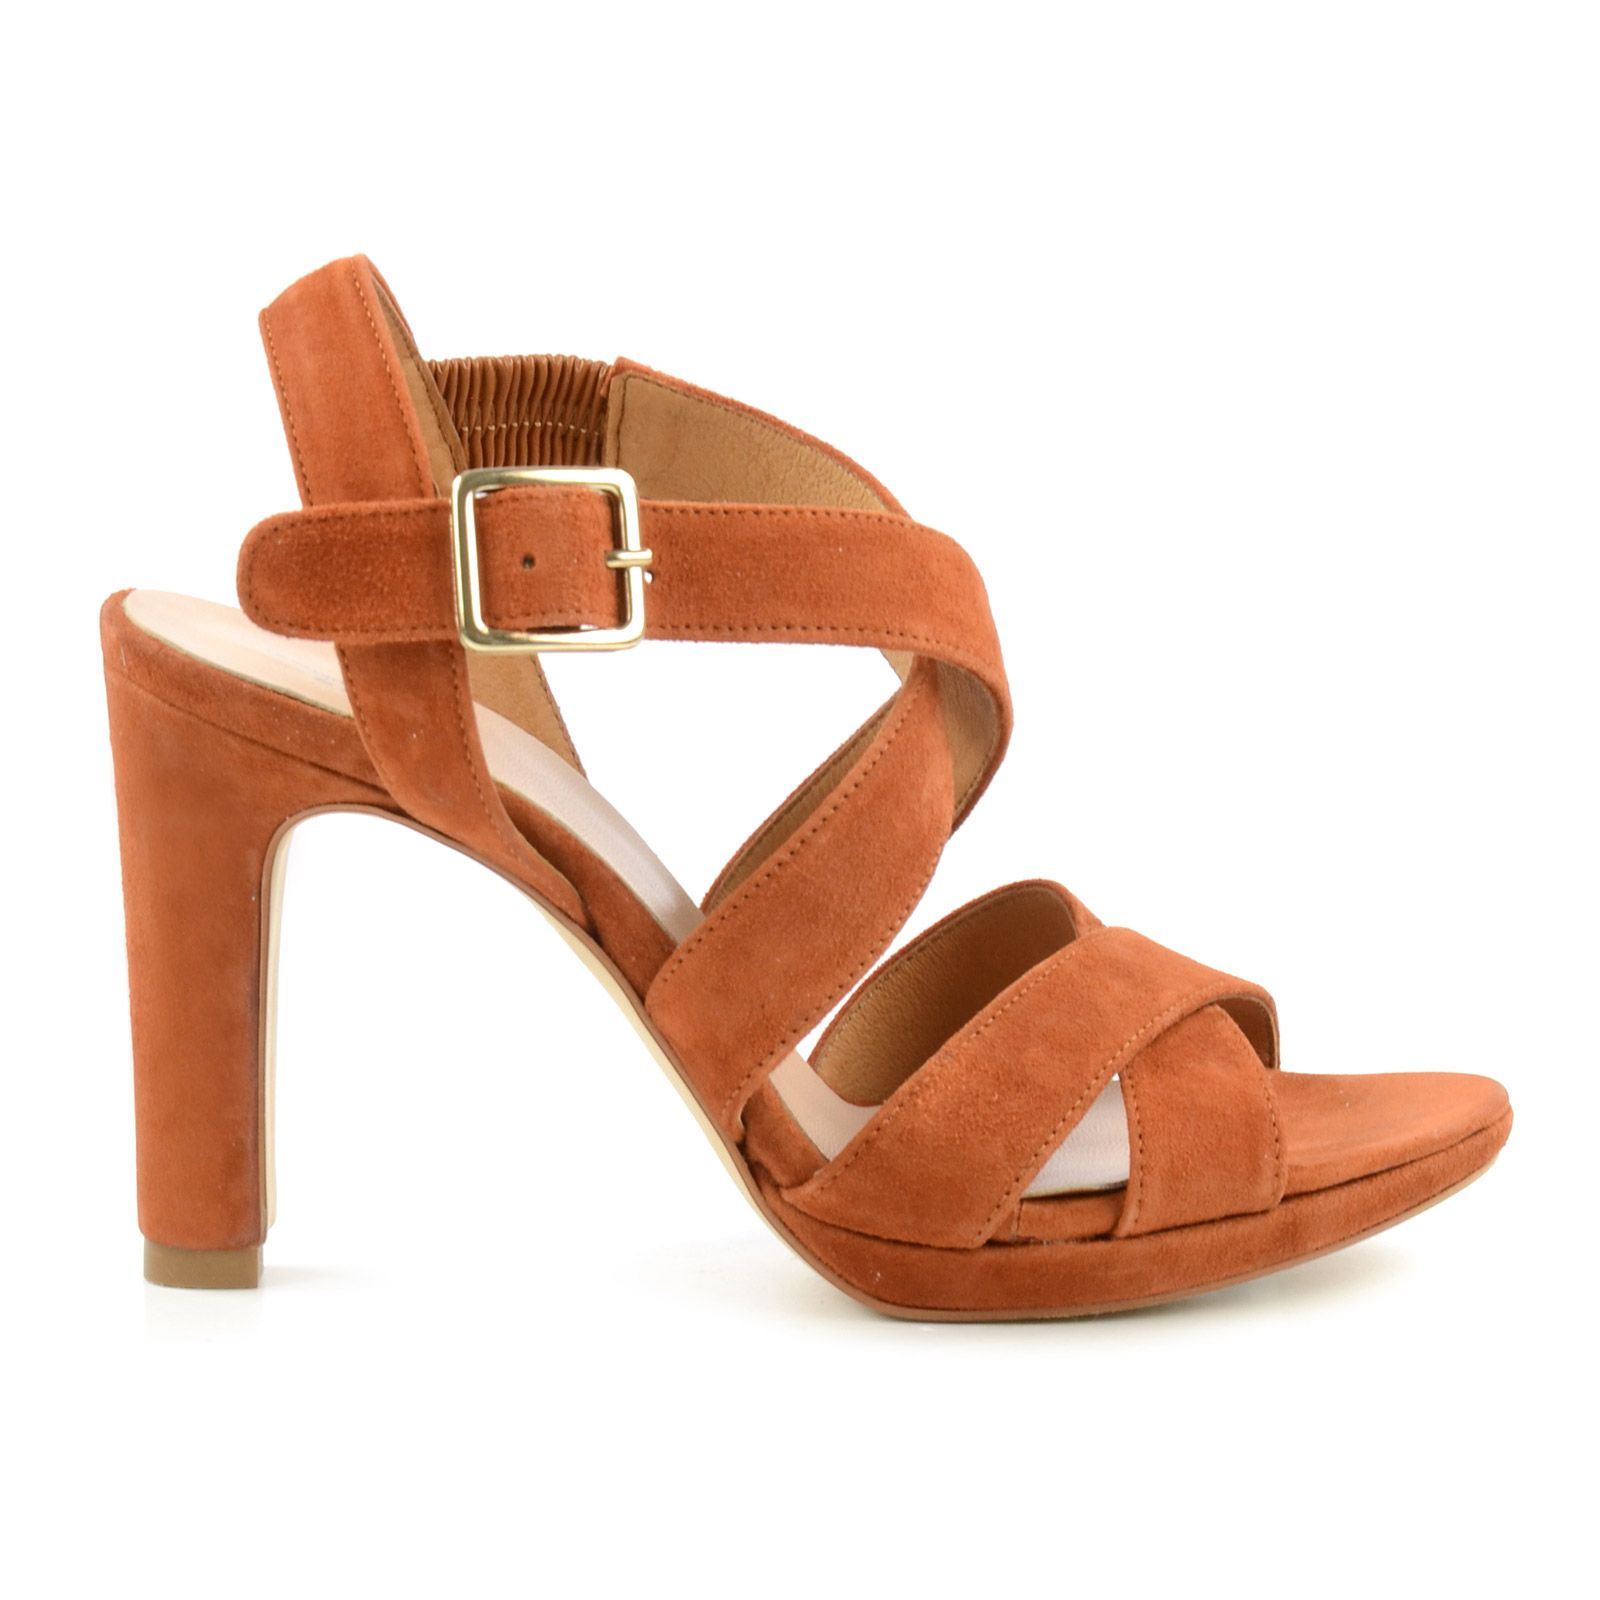 veloursleder sandalen mit absatz damenschuhe. Black Bedroom Furniture Sets. Home Design Ideas